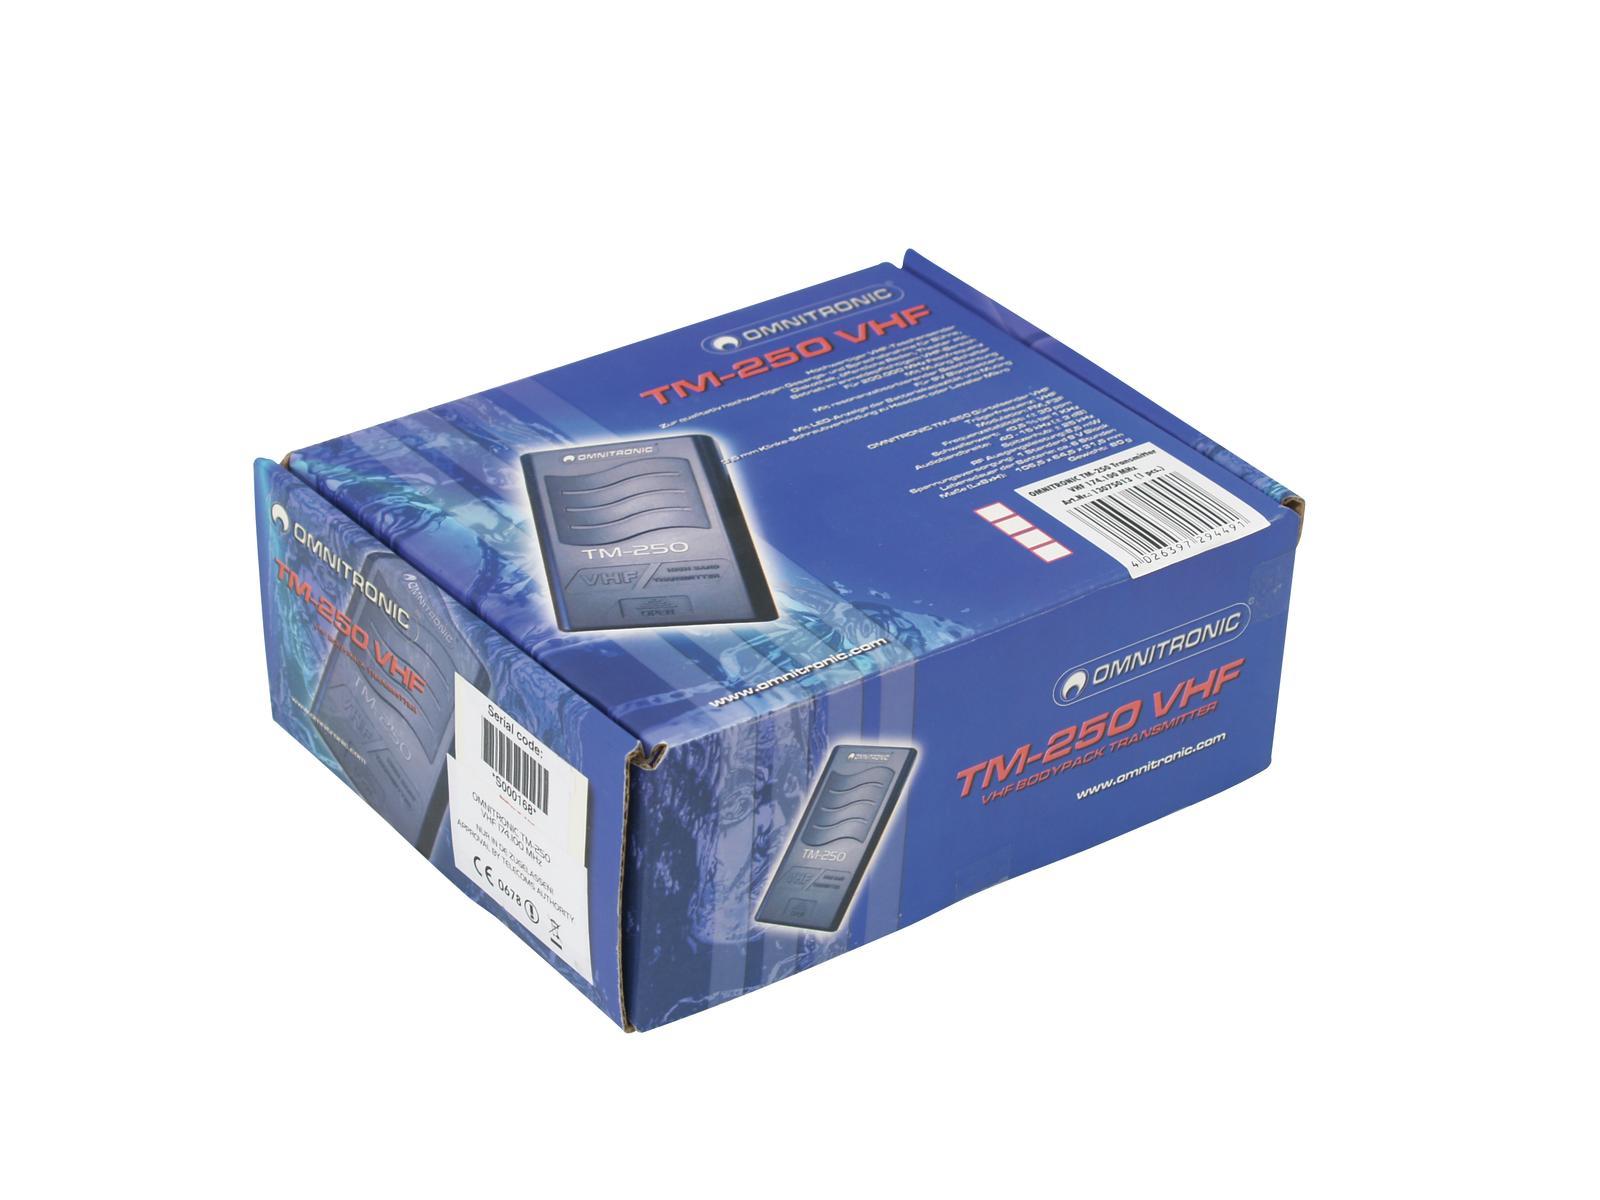 OMNITRONIC TM-250 Trasmettitore tascabile VHF179.000